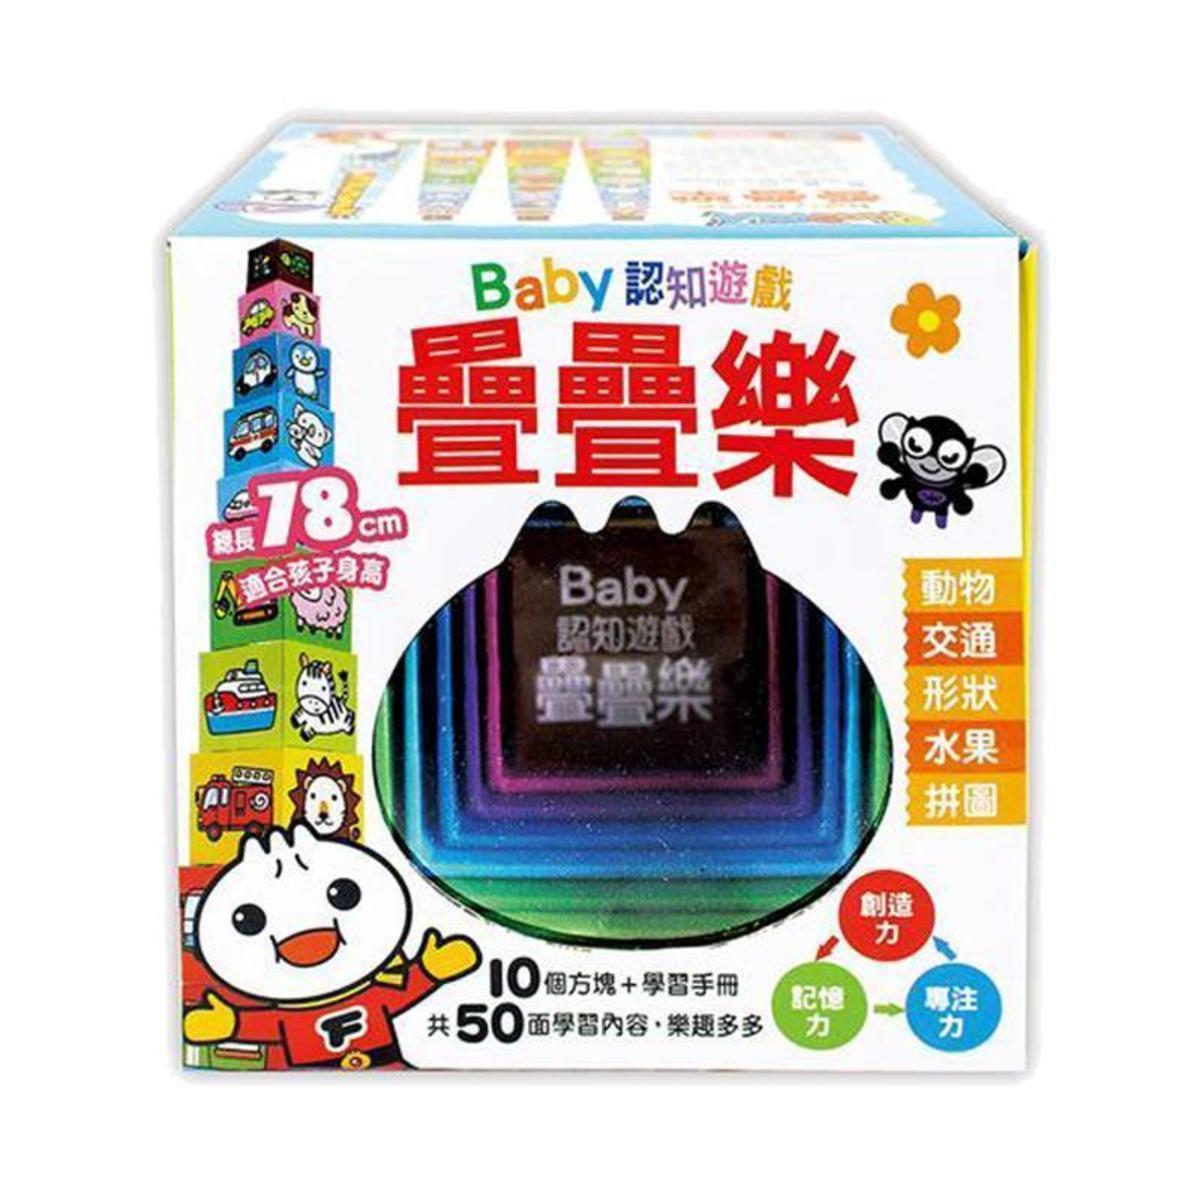 Baby認知遊戲疊疊樂 台灣進口 (2歲以上)